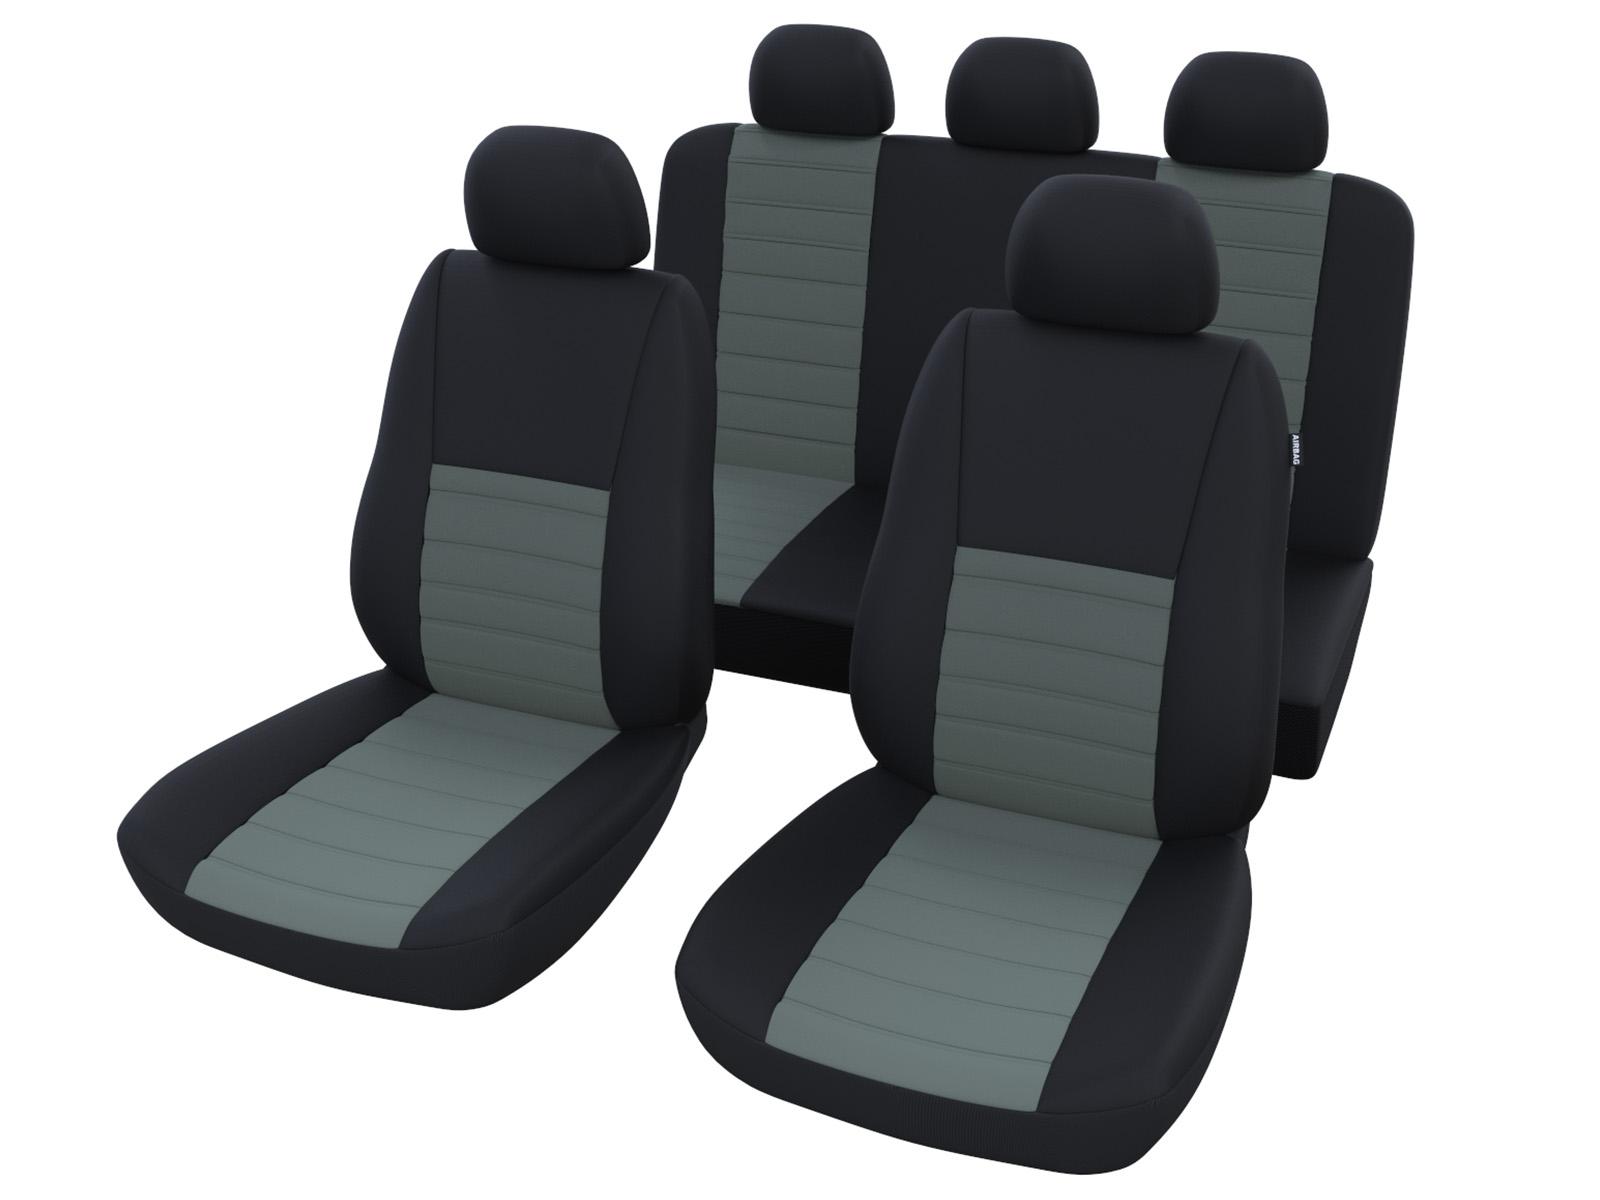 auto sitzbez ge schwarz grau autositz schonbezug. Black Bedroom Furniture Sets. Home Design Ideas